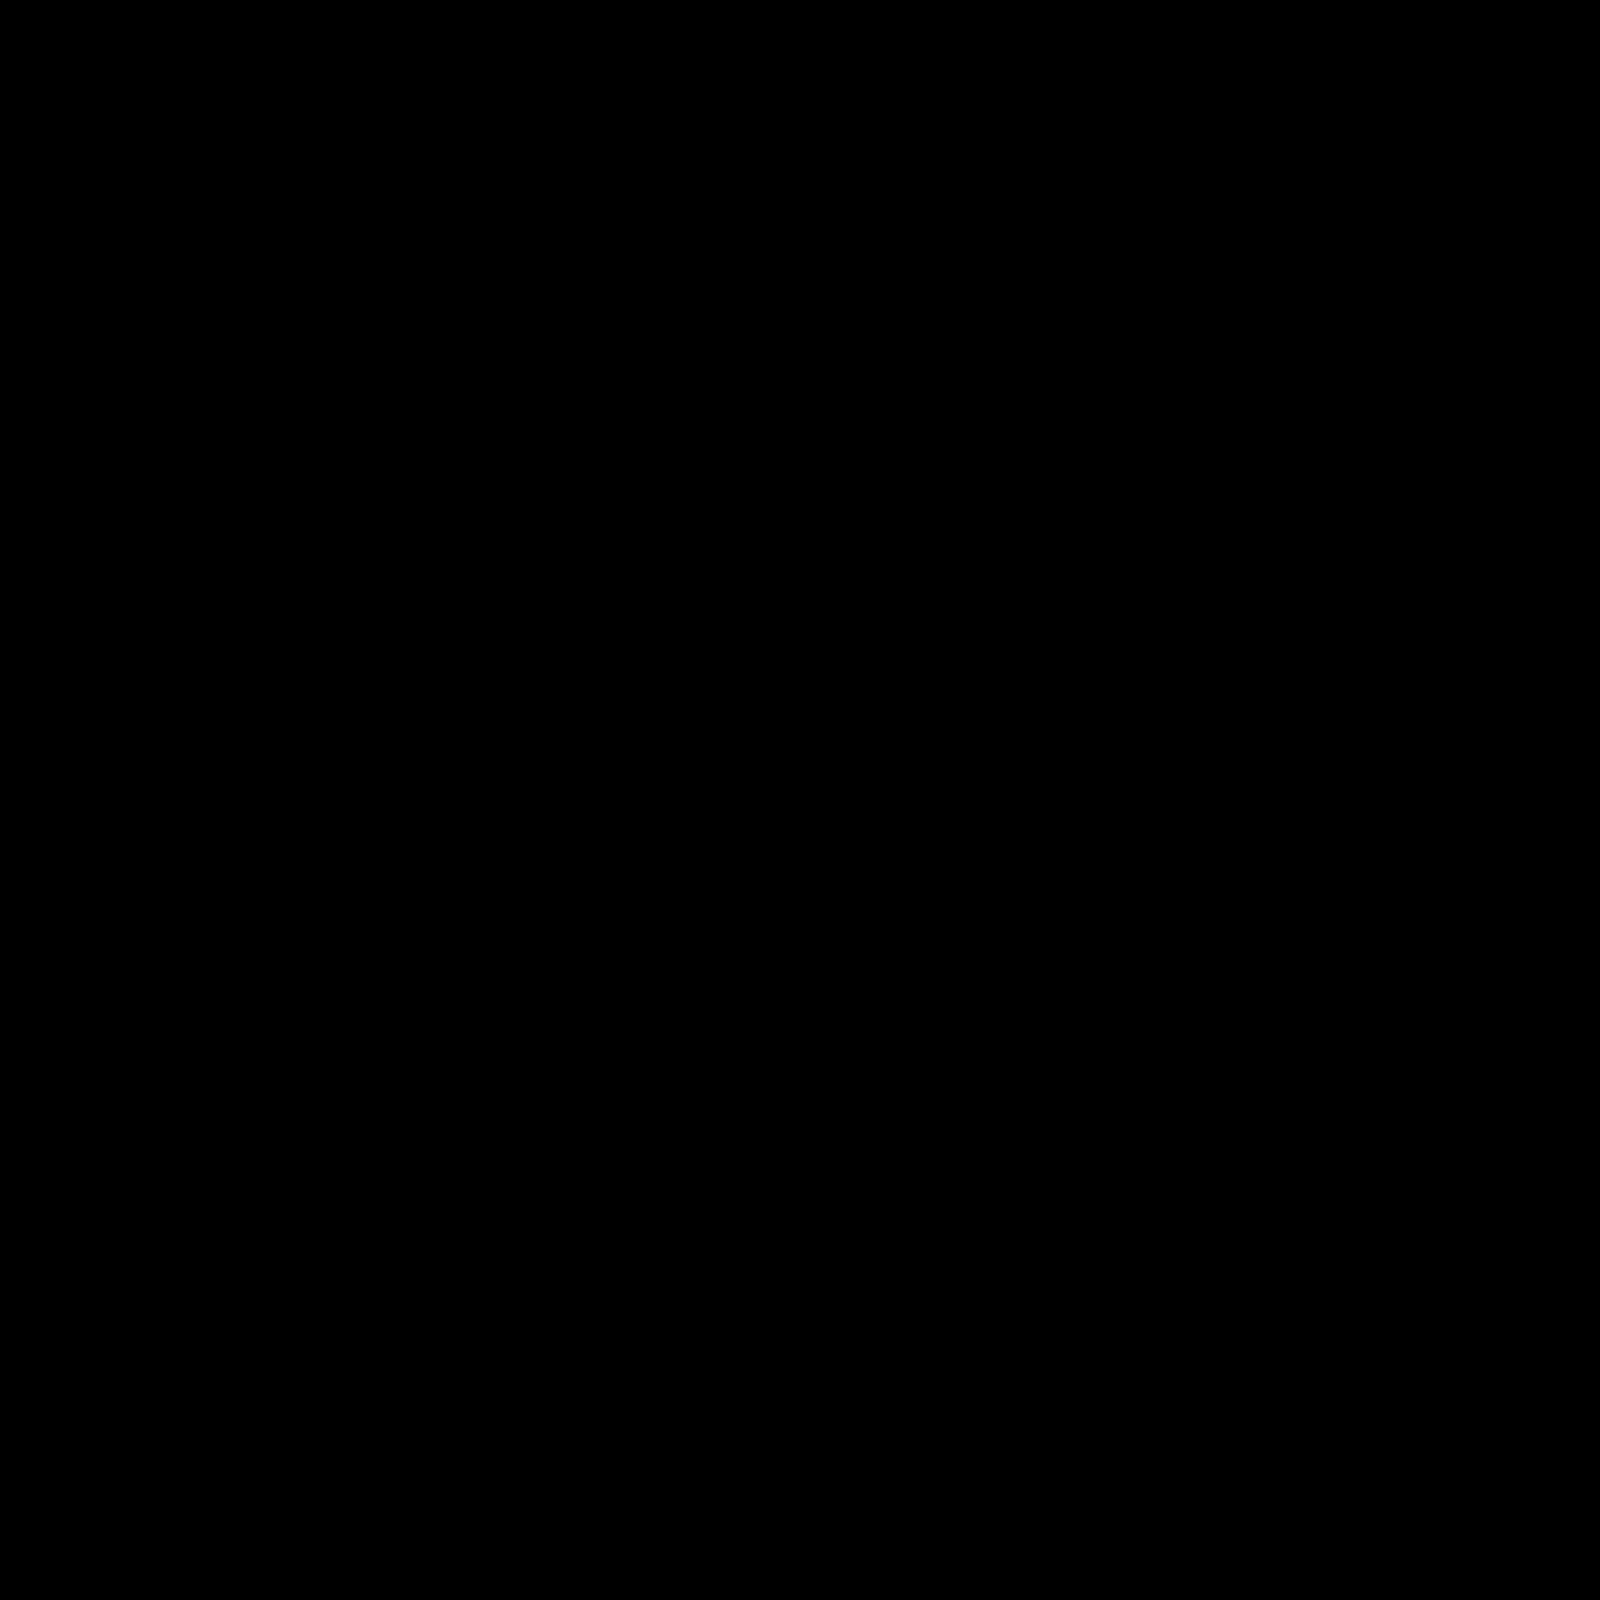 81 icon